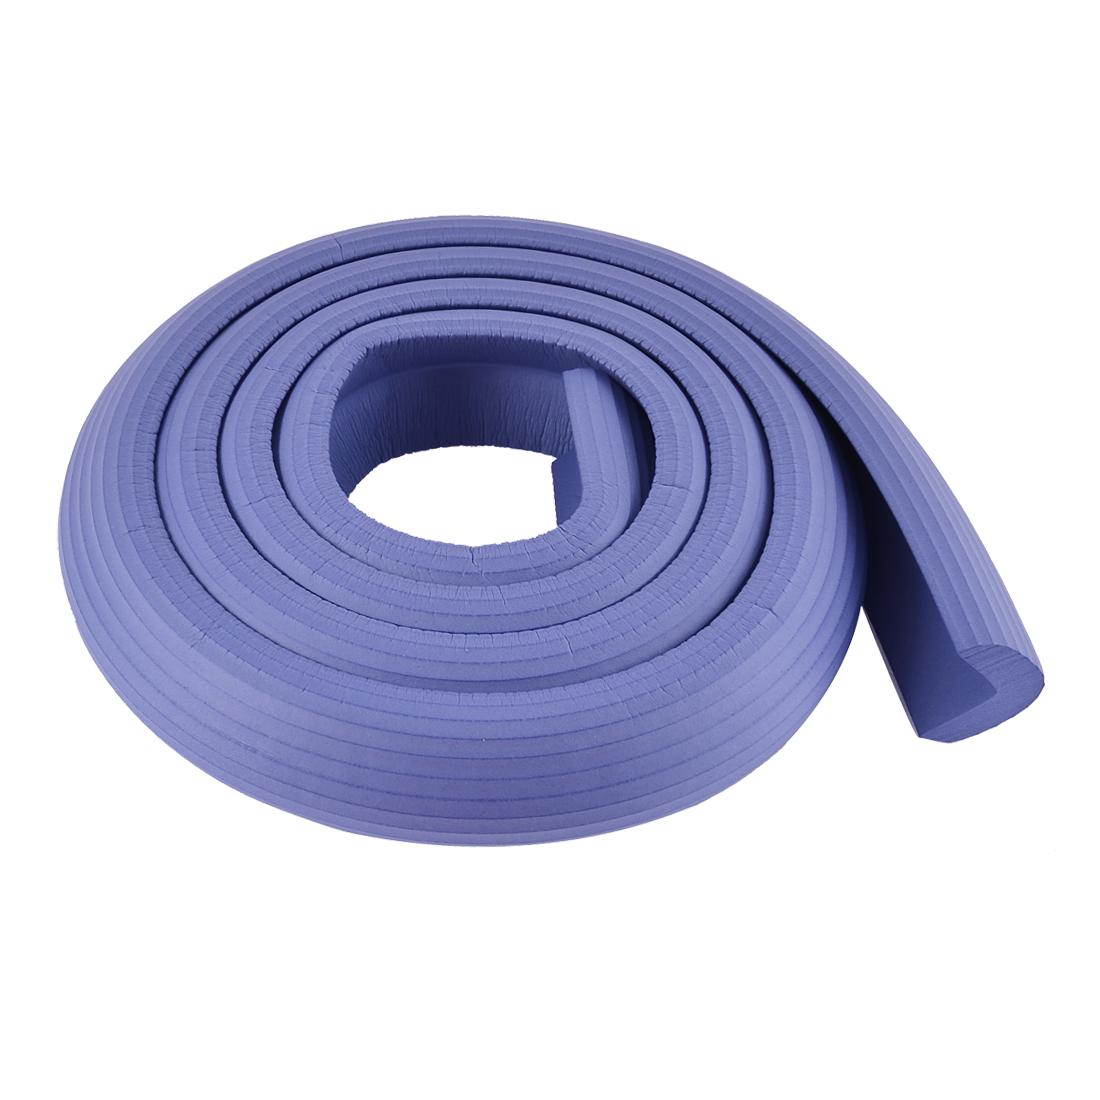 Furniture Corner Edge Soft Safety Protection Cushion Guard Blue w Adhesive Tape